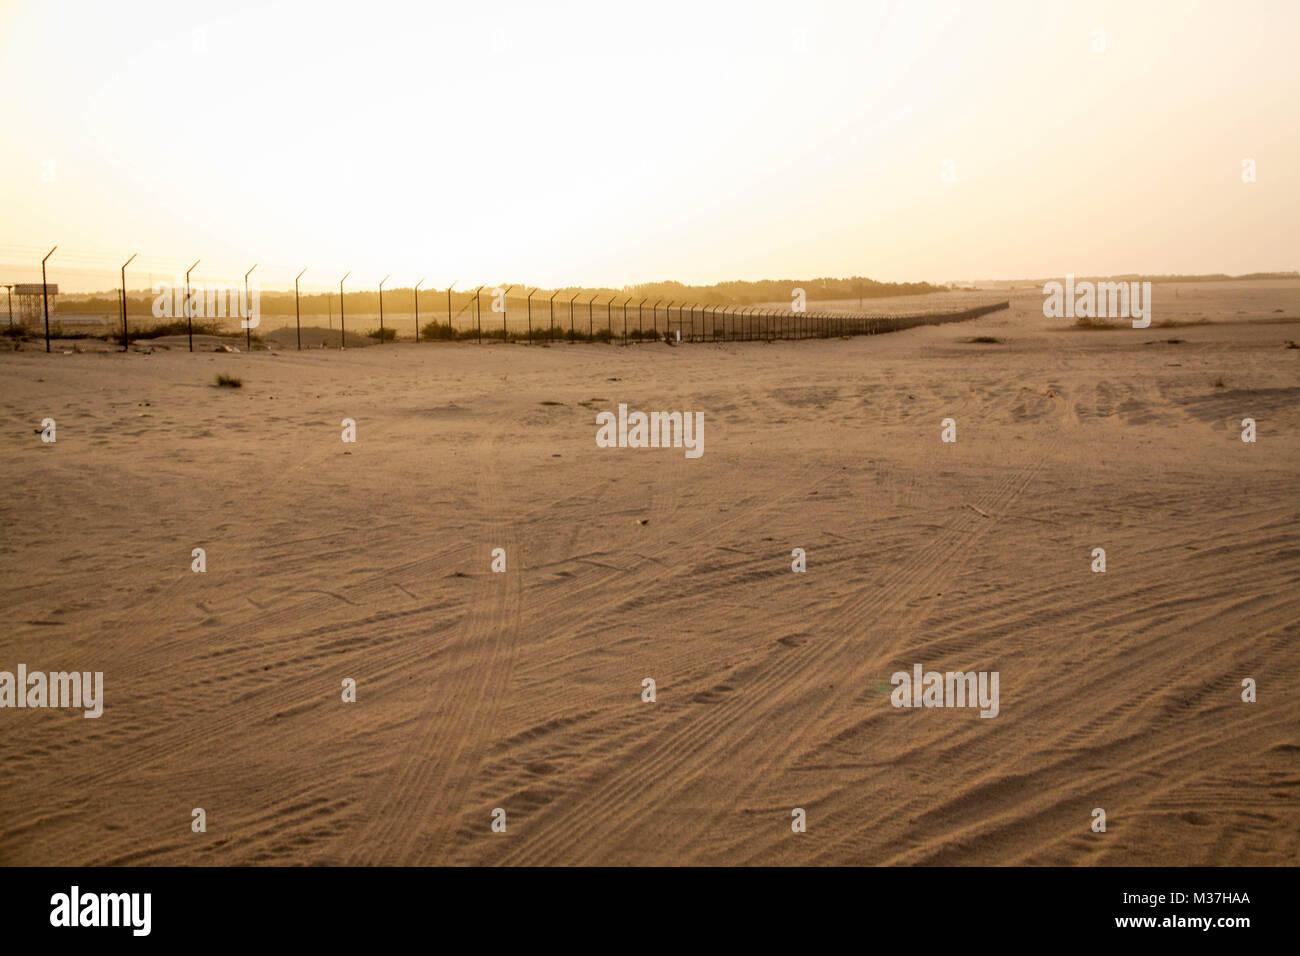 Desert landscape in Kuwait. - Stock Image